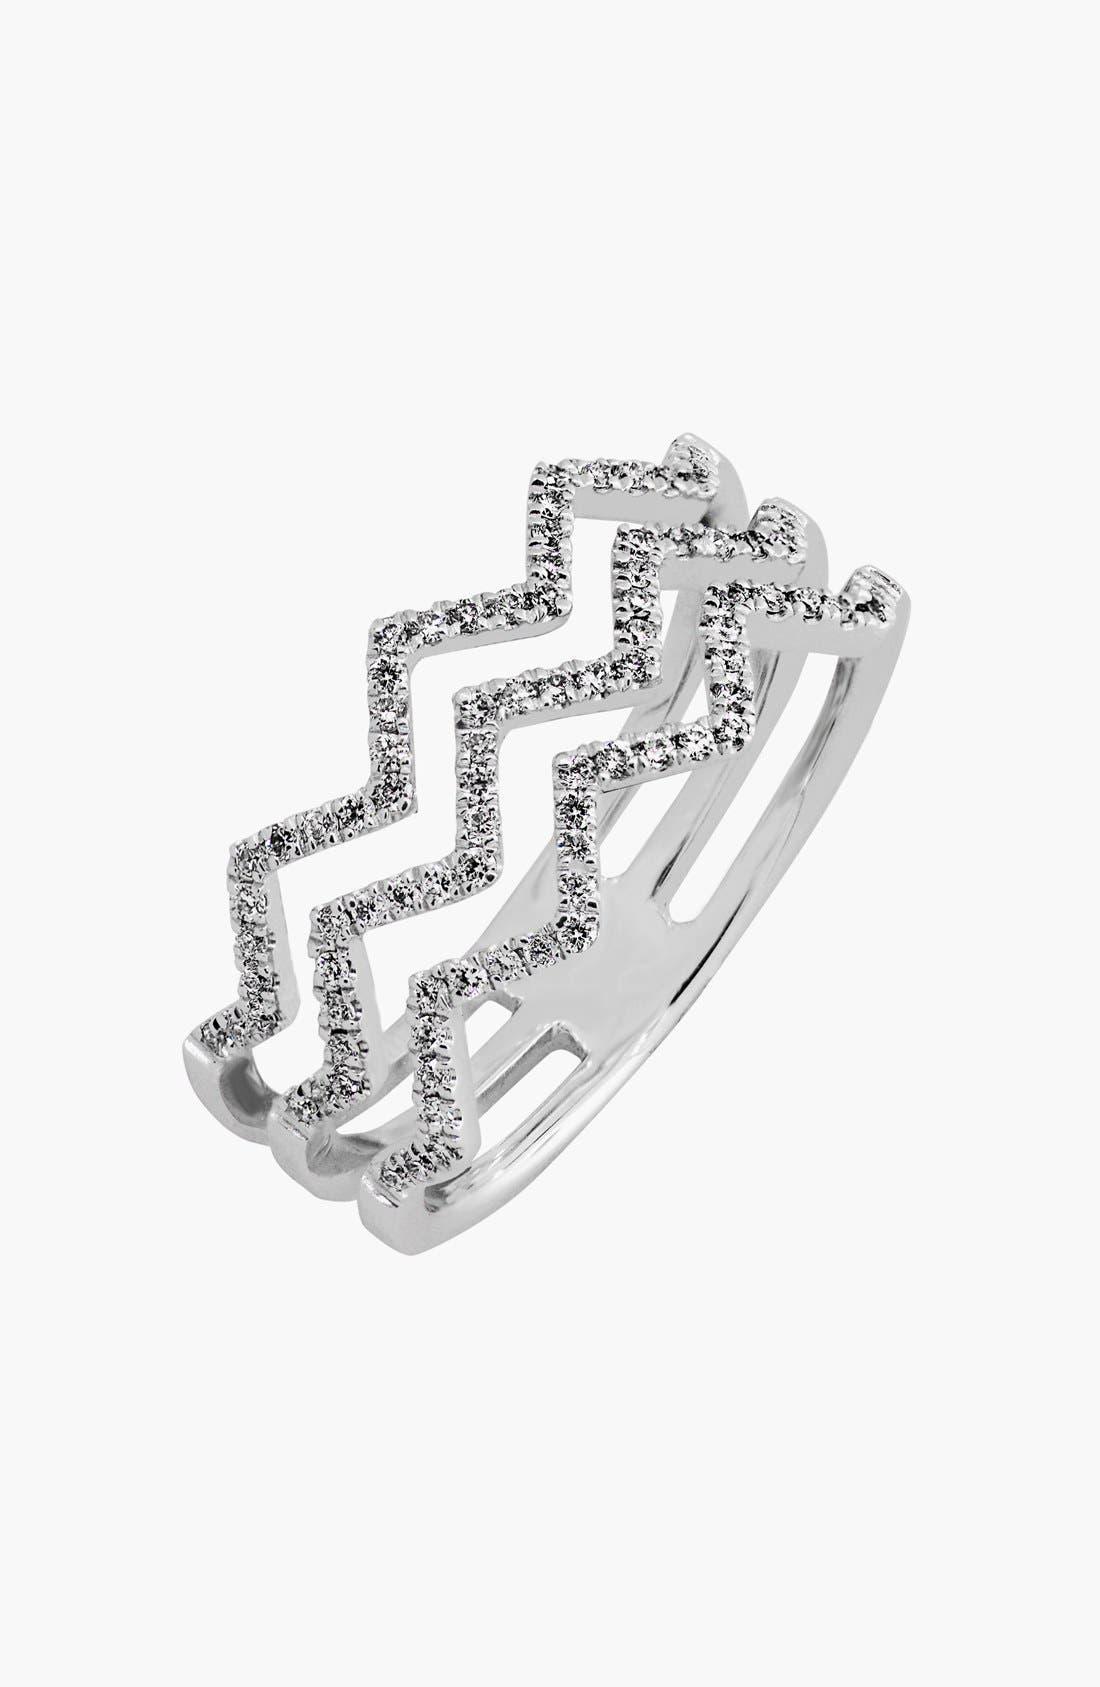 'Prism' 3-Row Diamond Ring,                             Main thumbnail 1, color,                             WHITE GOLD